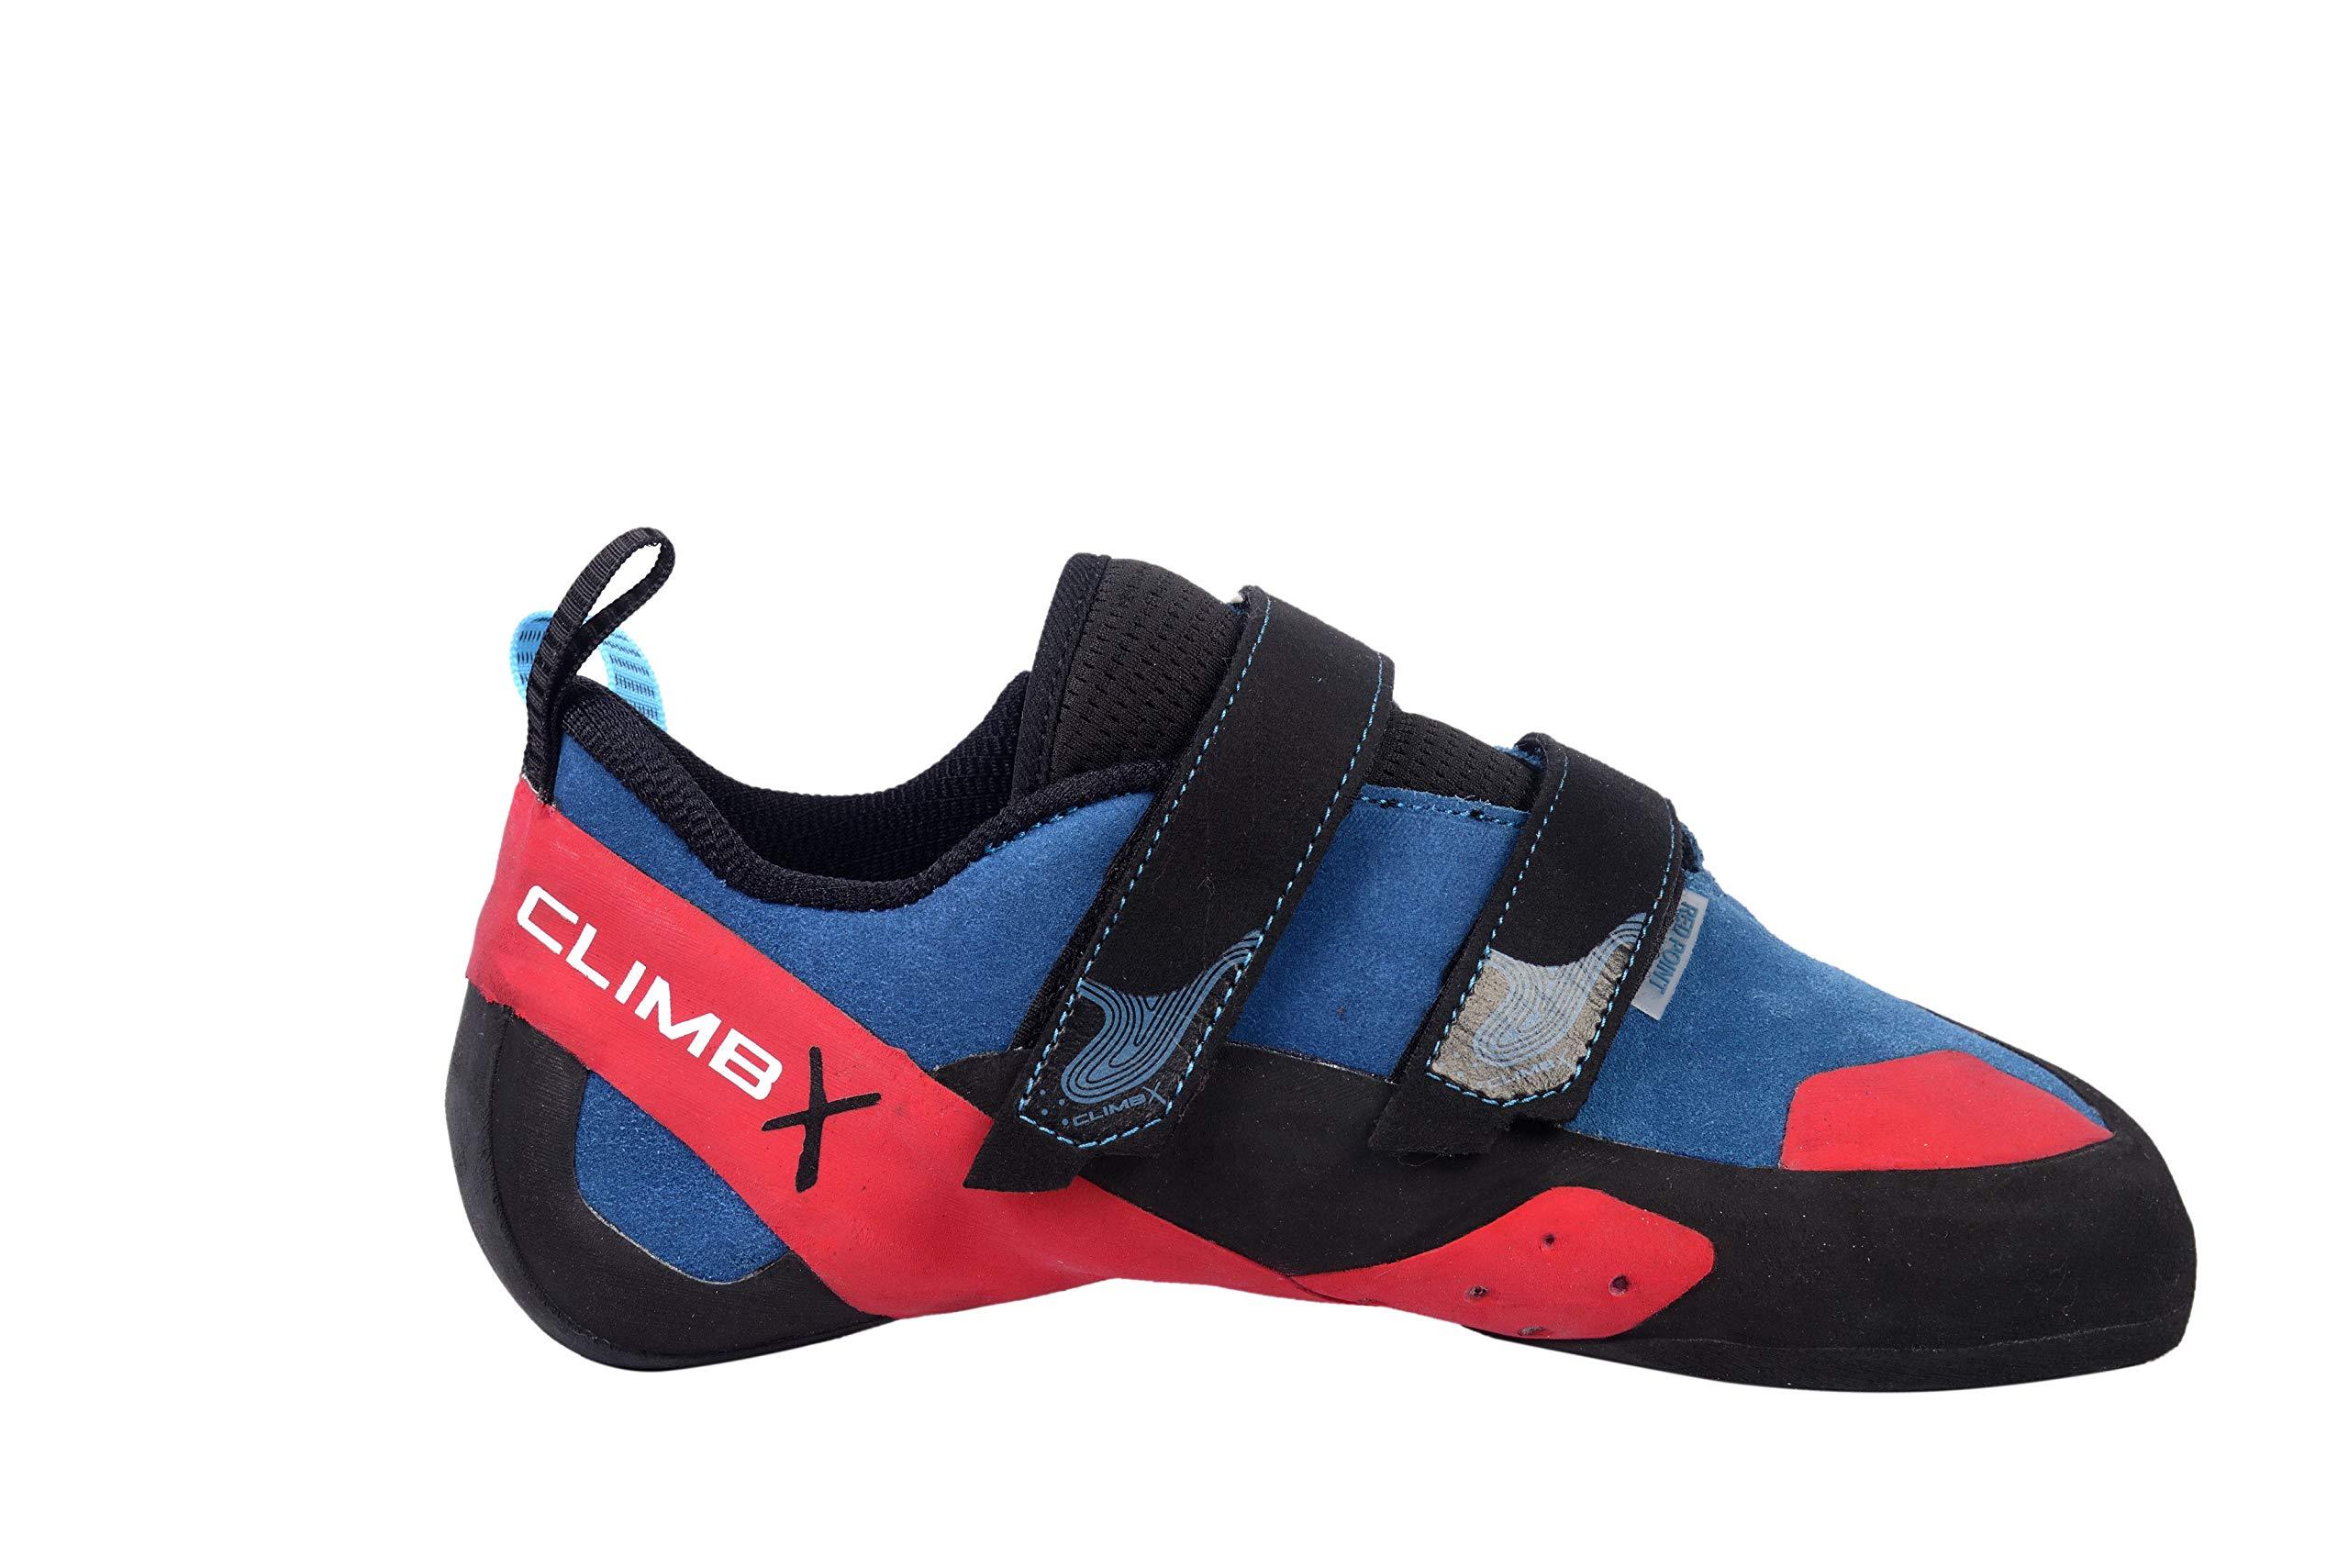 Climb X Gear Red Point Climbing Shoe 2019 (8) by Climb X